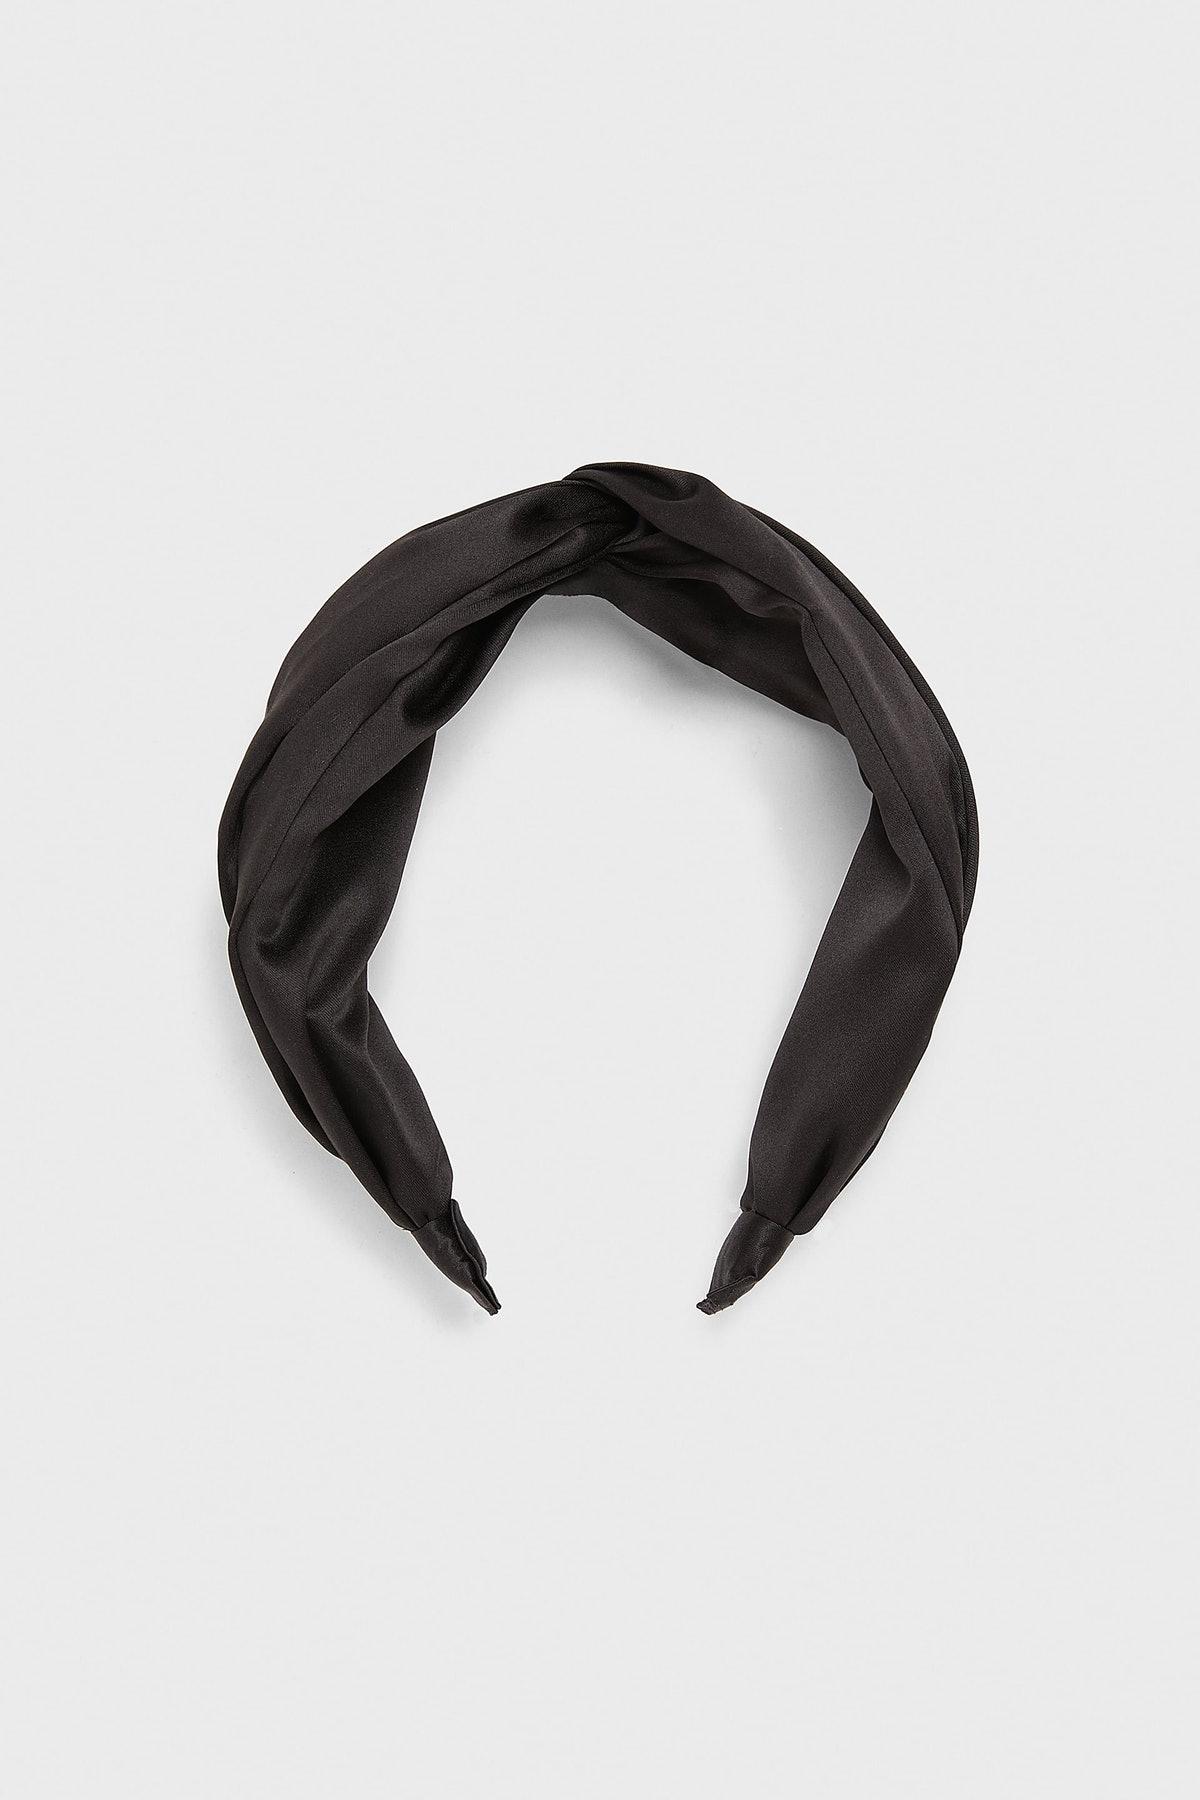 Satin Effect Headband With Knot